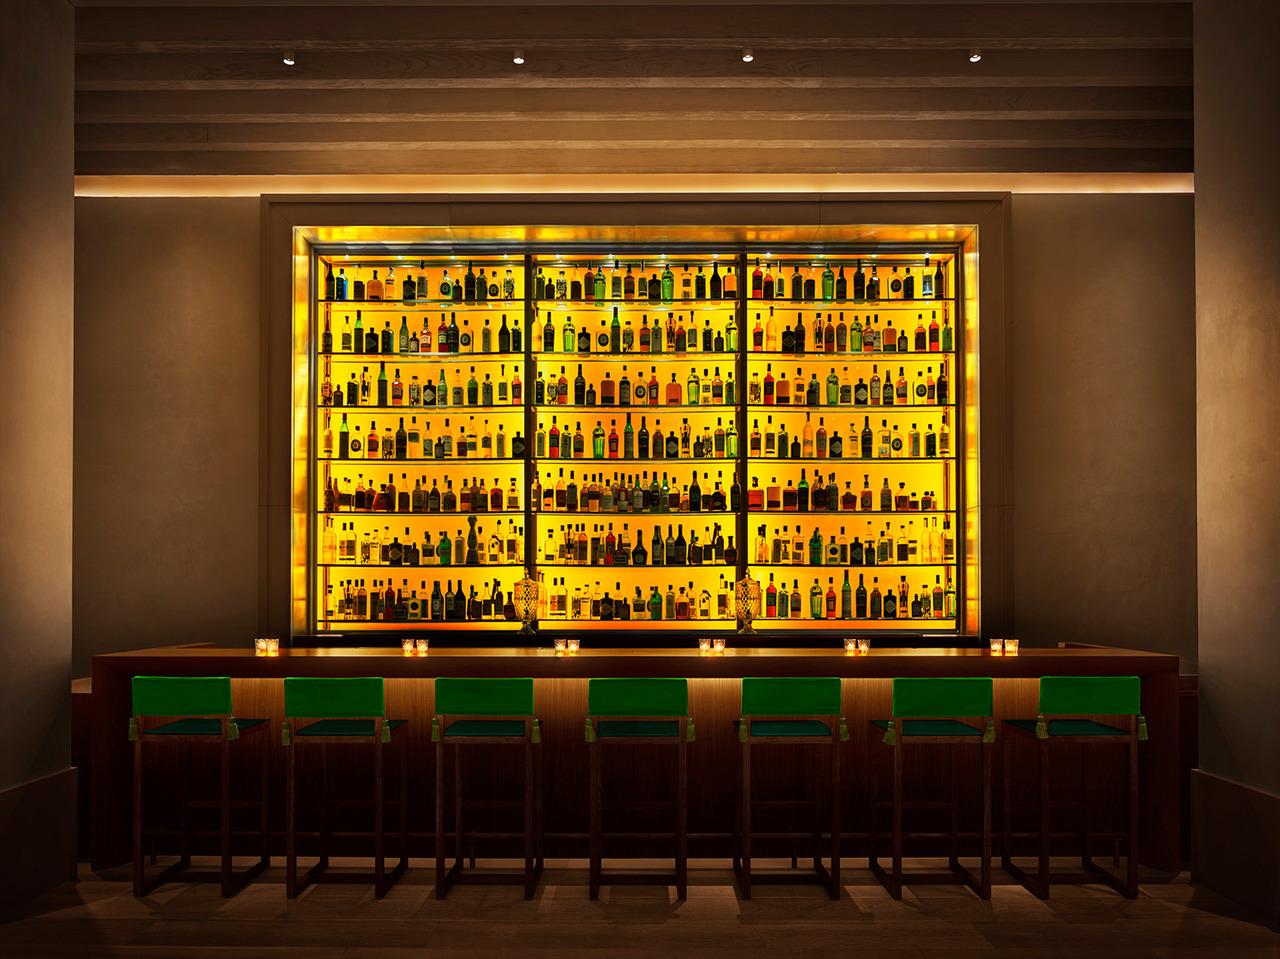 Lobby-Bar-1870x1400.jpg